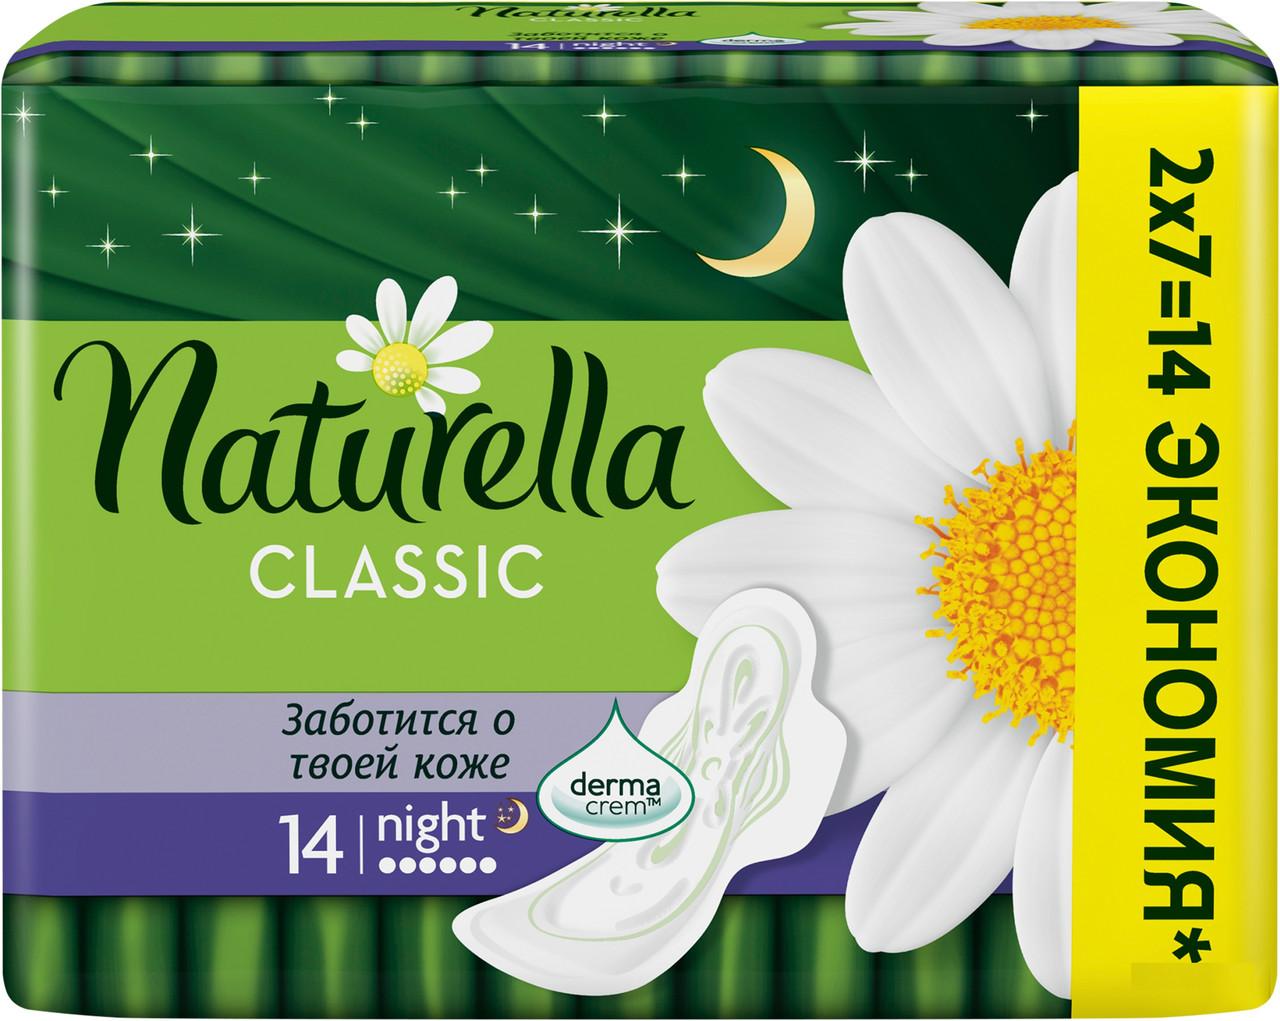 Naturella Classic Night Ромашка 14 шт (6 крапель)